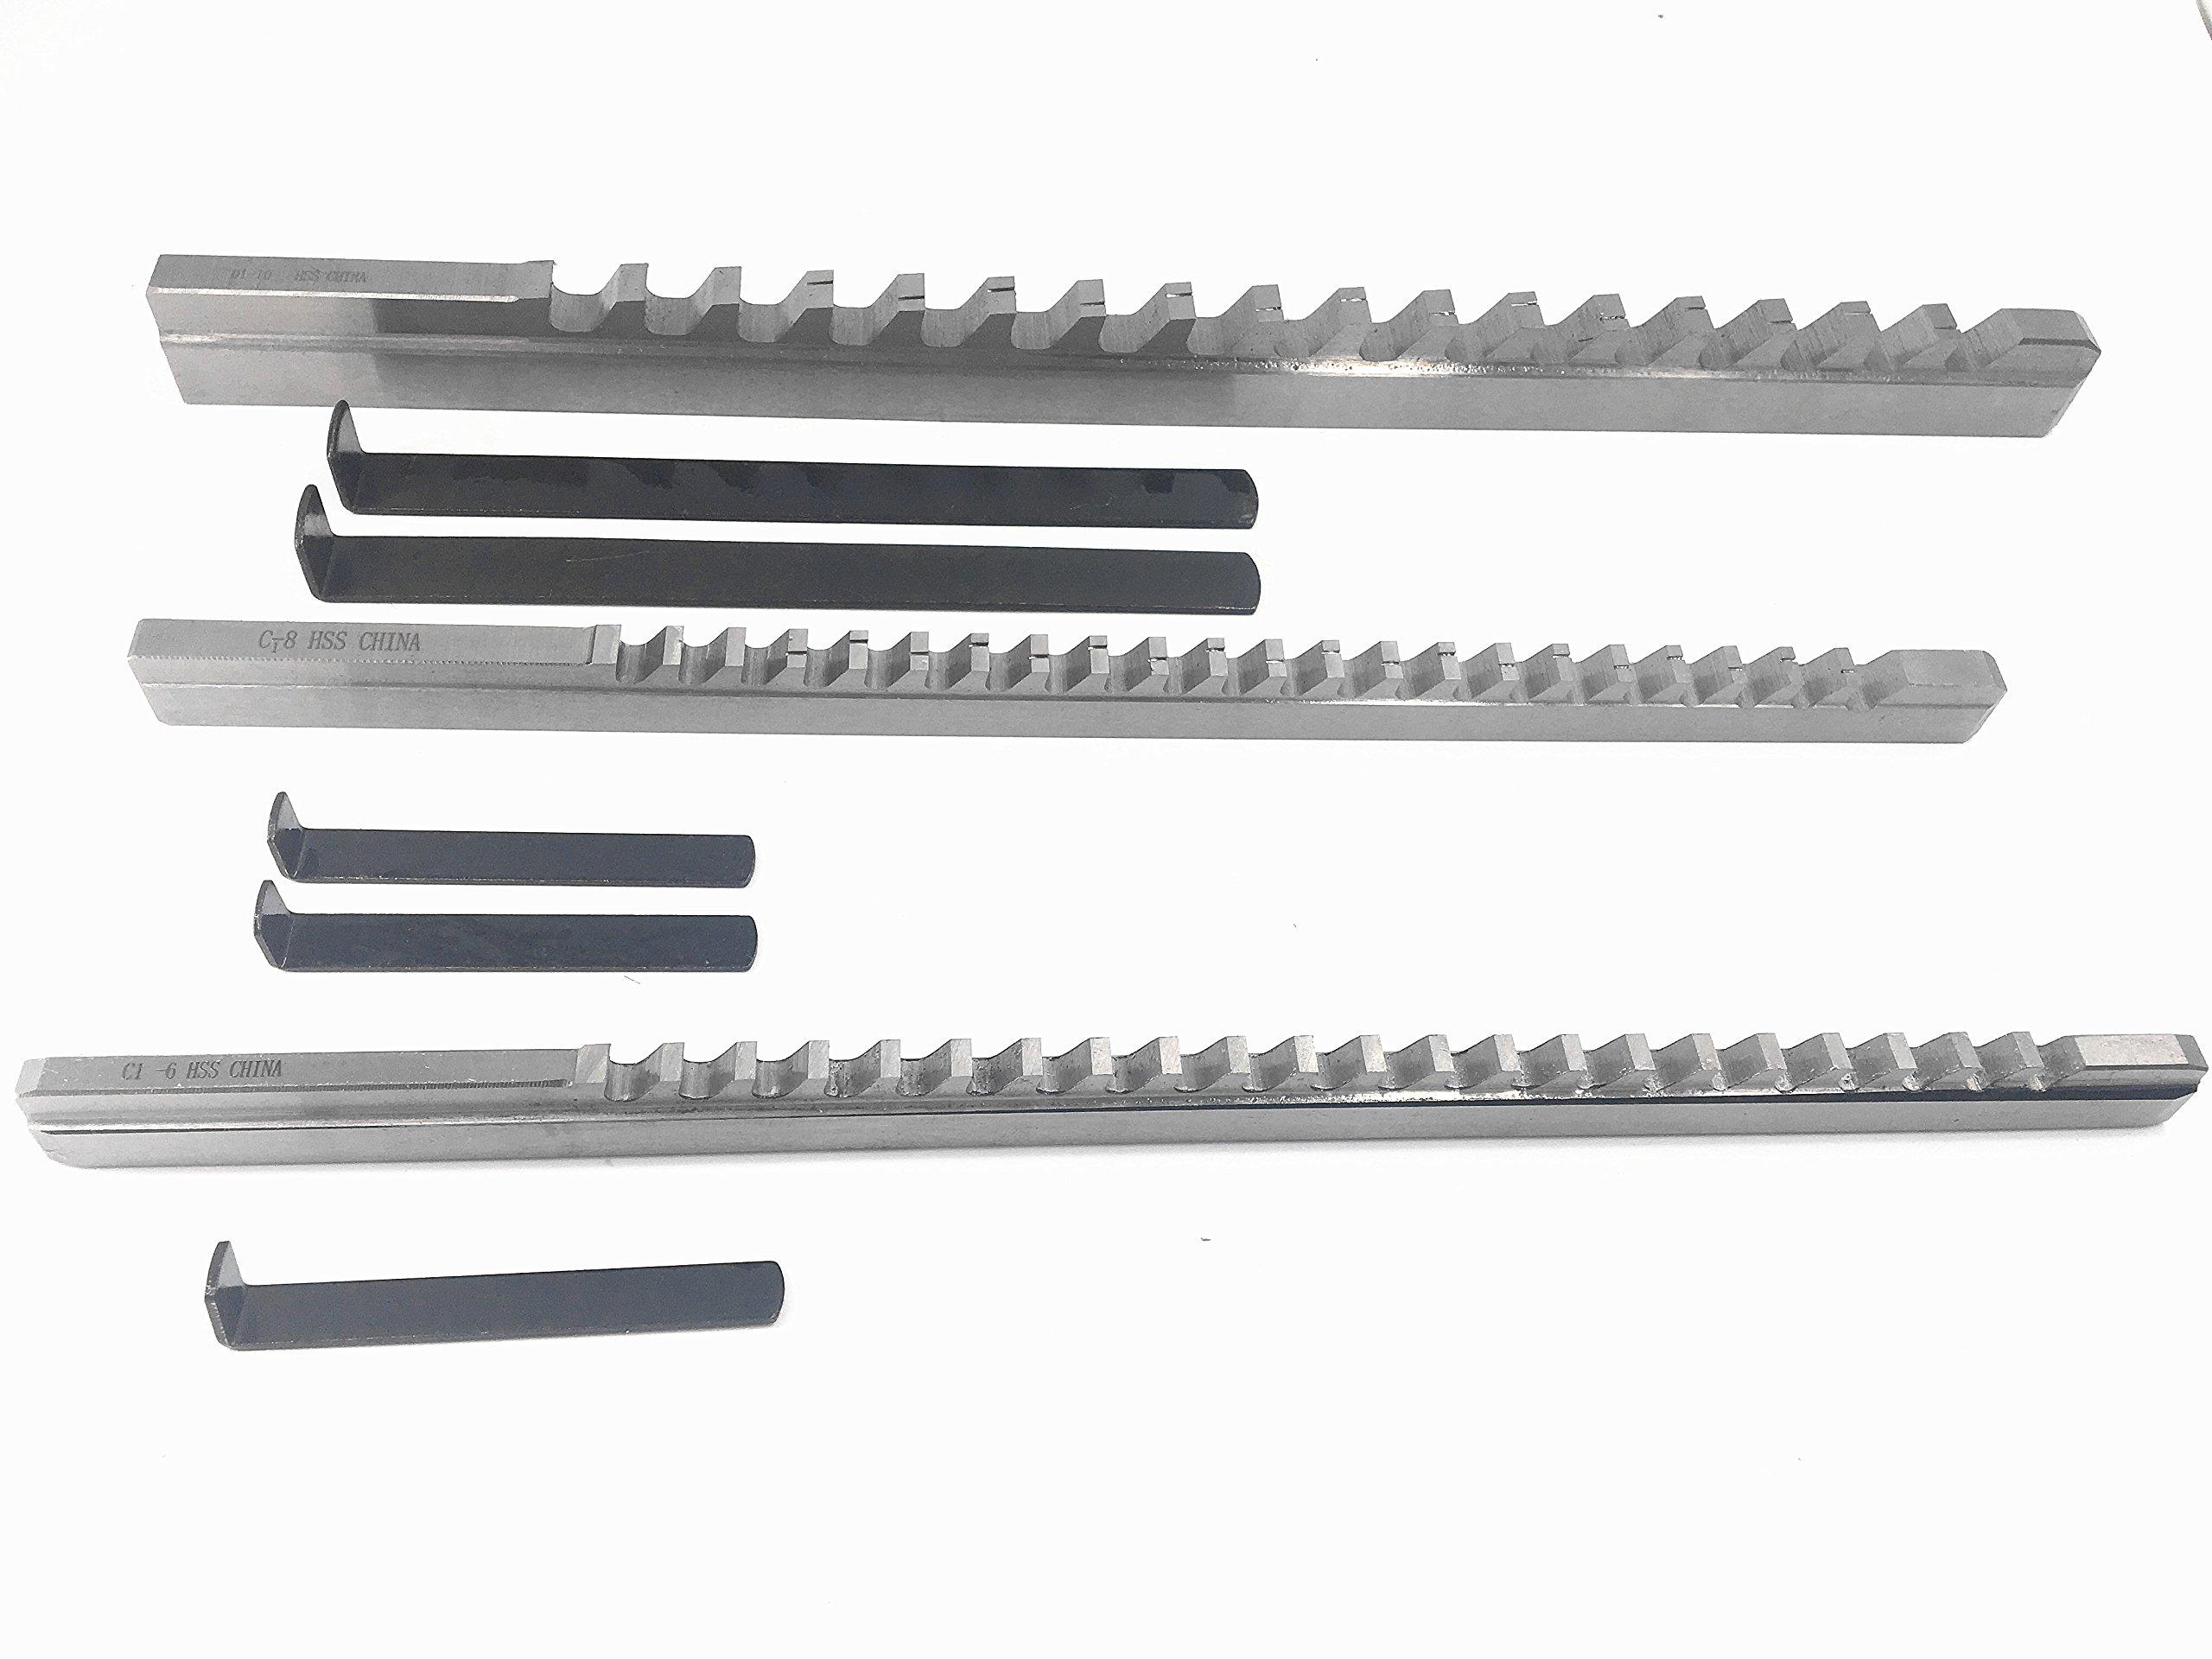 Keyway Broach B C D Type HSS Cutting Cutter Metric Inch Size CNC Metalwork (4mm B1 Push-Type)